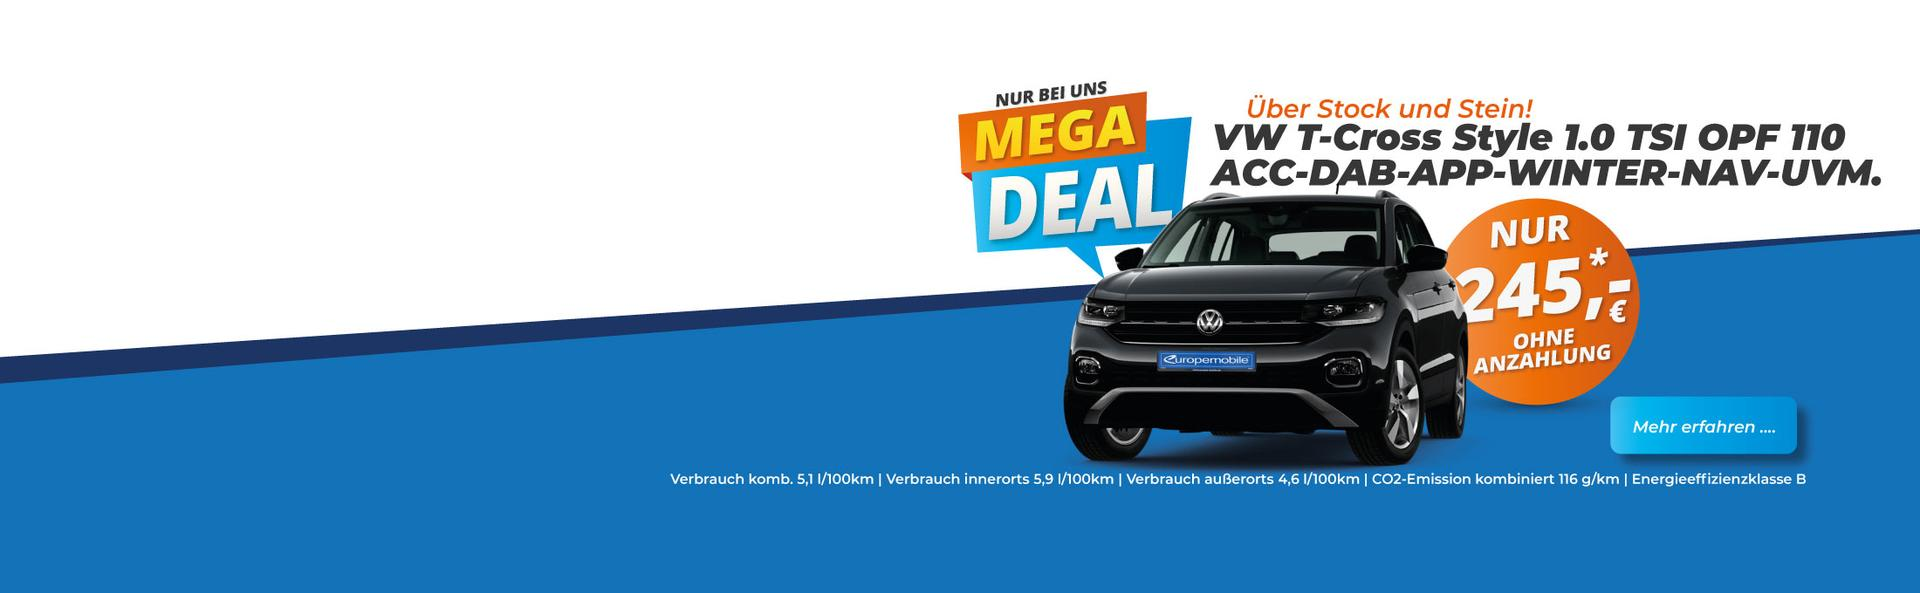 EU Neuwagen Leasing Angebot VW T-Cross